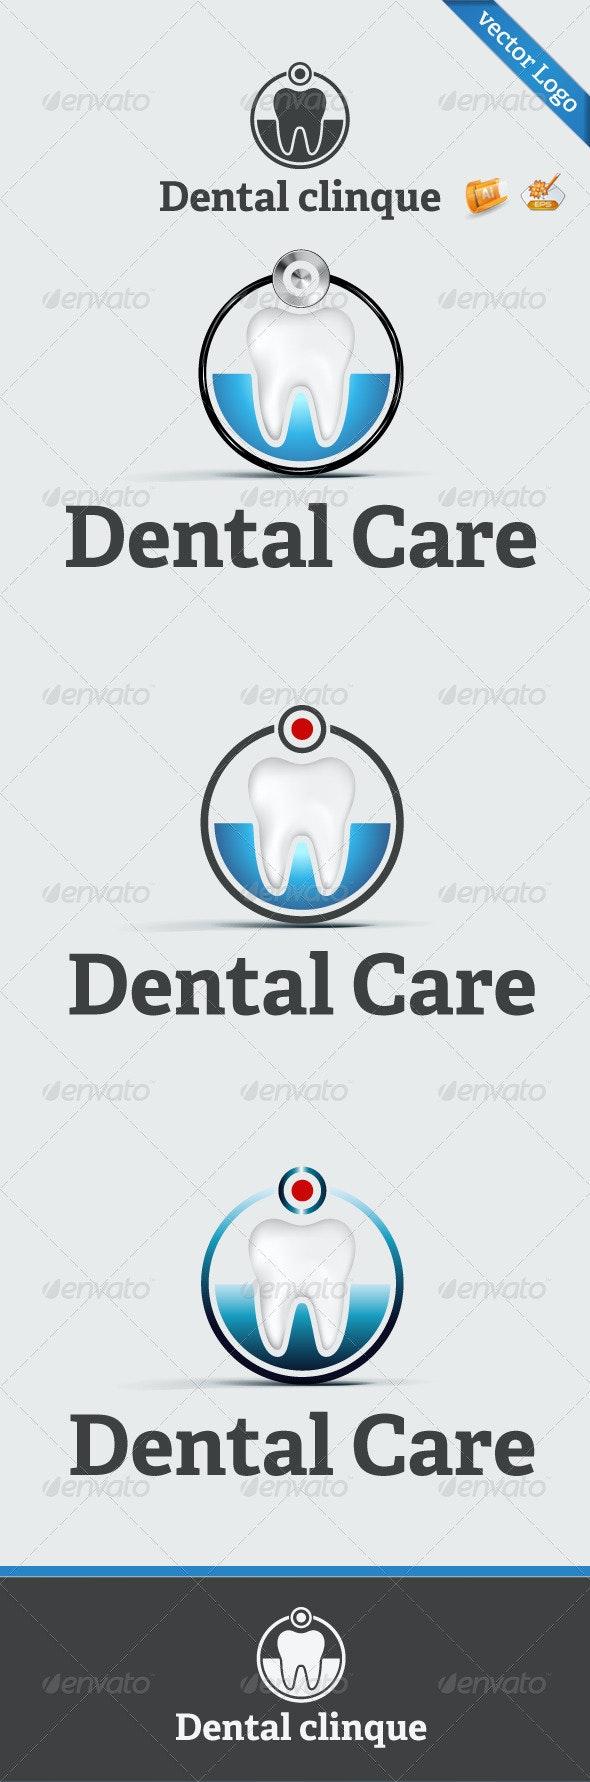 Dental Clinique Logo Template  - Symbols Logo Templates